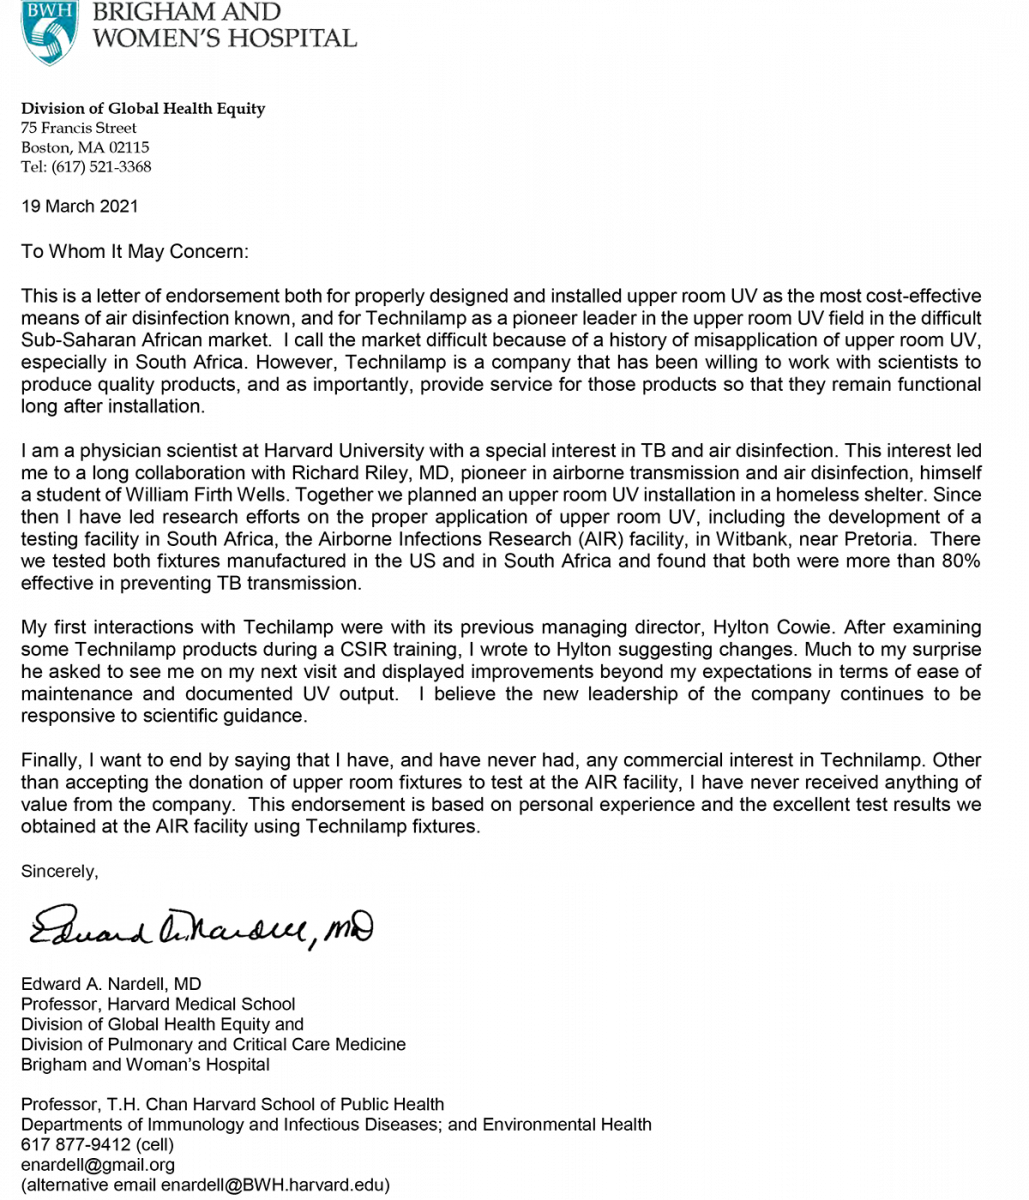 Frank & sons electrical Ltd Harvard-University-Letter Guvtec, Germicidal UV-C lighting